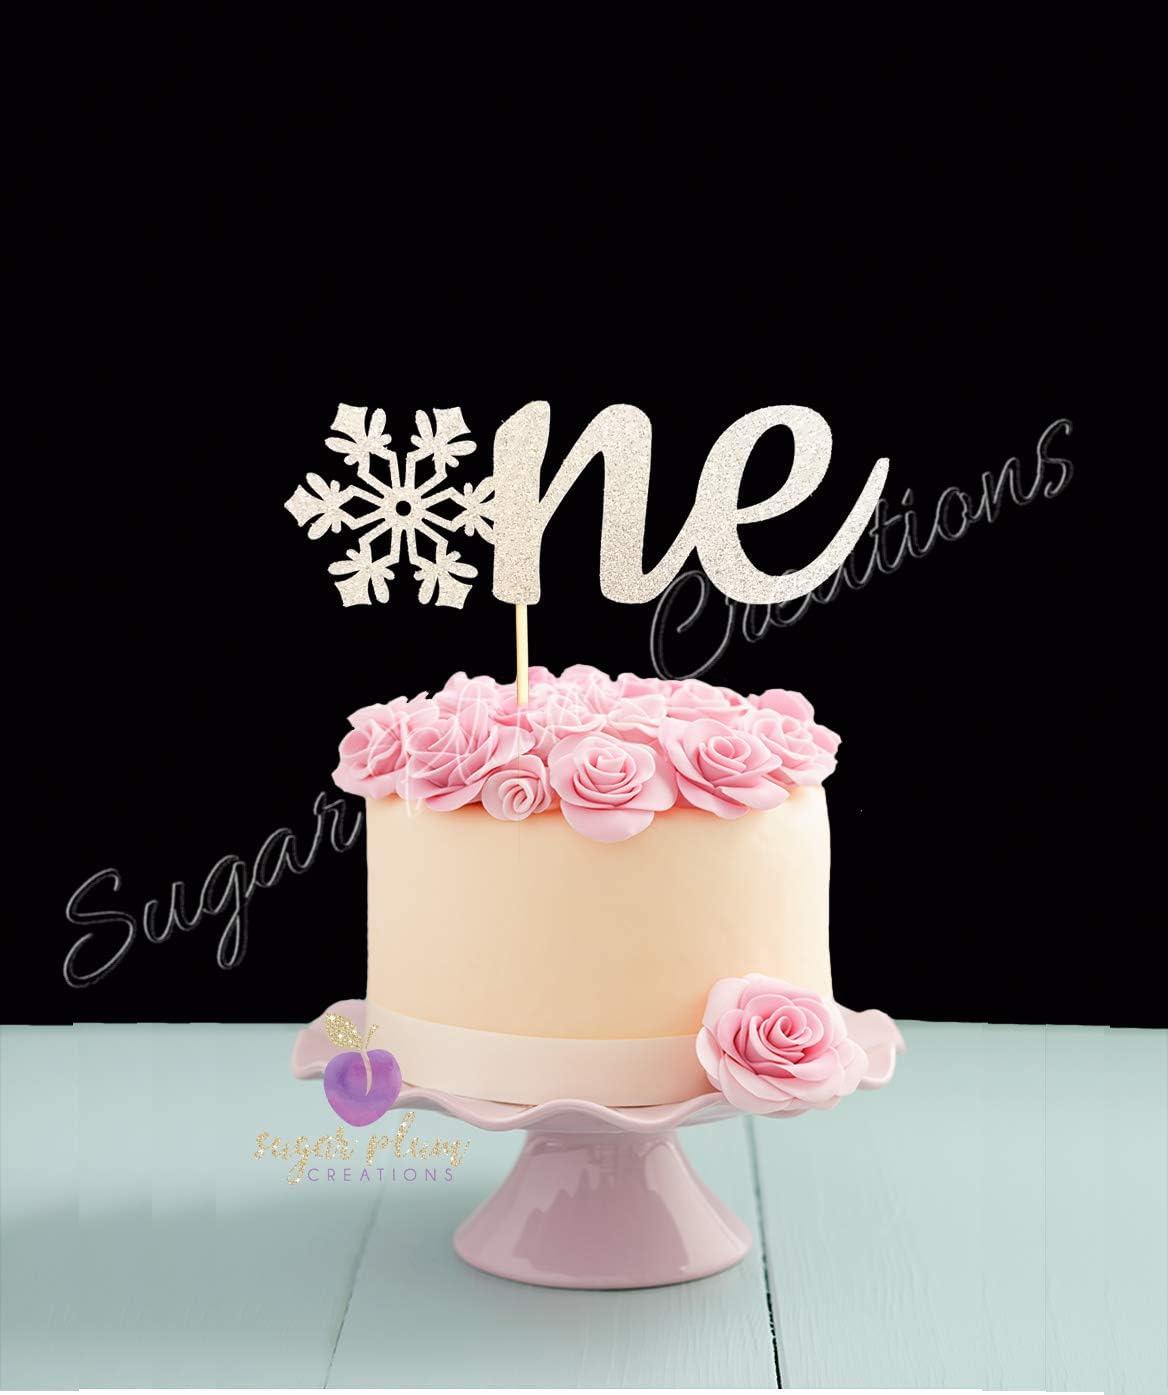 Wondrous Amazon Com Sugar Plum Creations One Snowflake Birthday Cake Personalised Birthday Cards Beptaeletsinfo